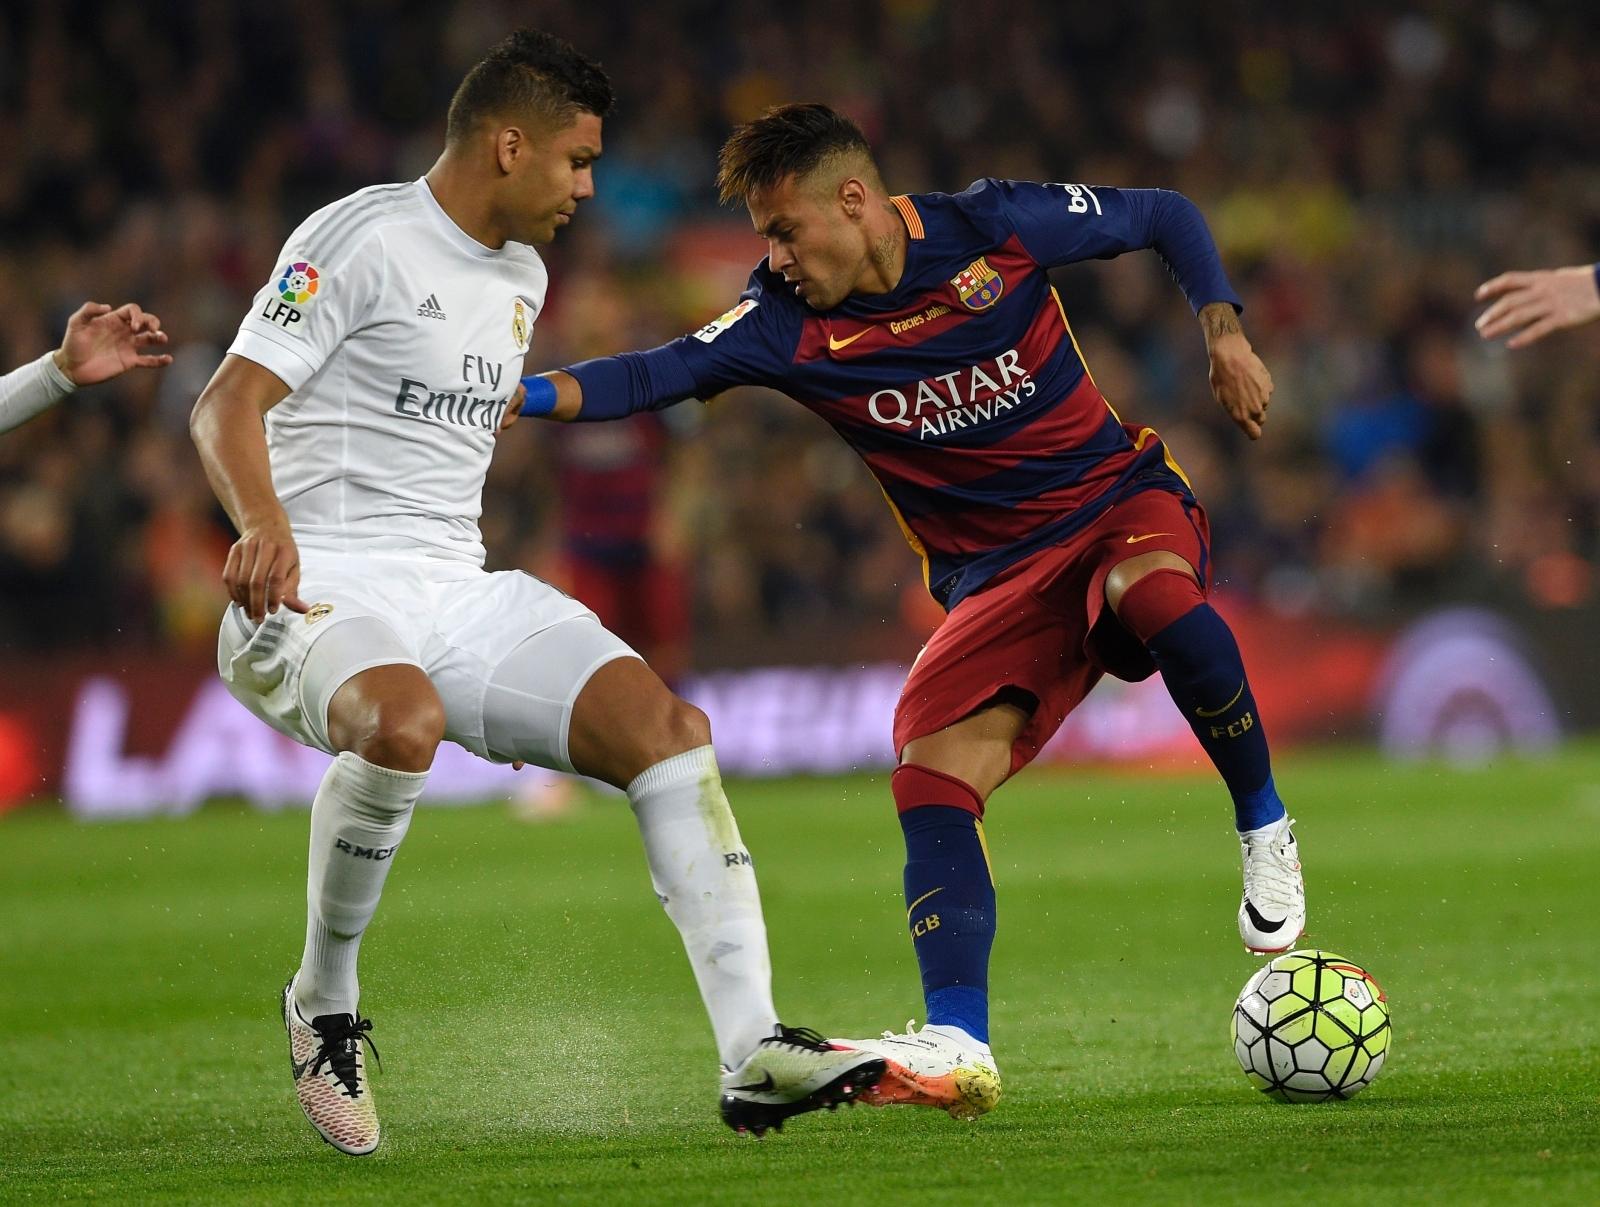 Casemiro would wel e Neymar making a shock move from Barcelona